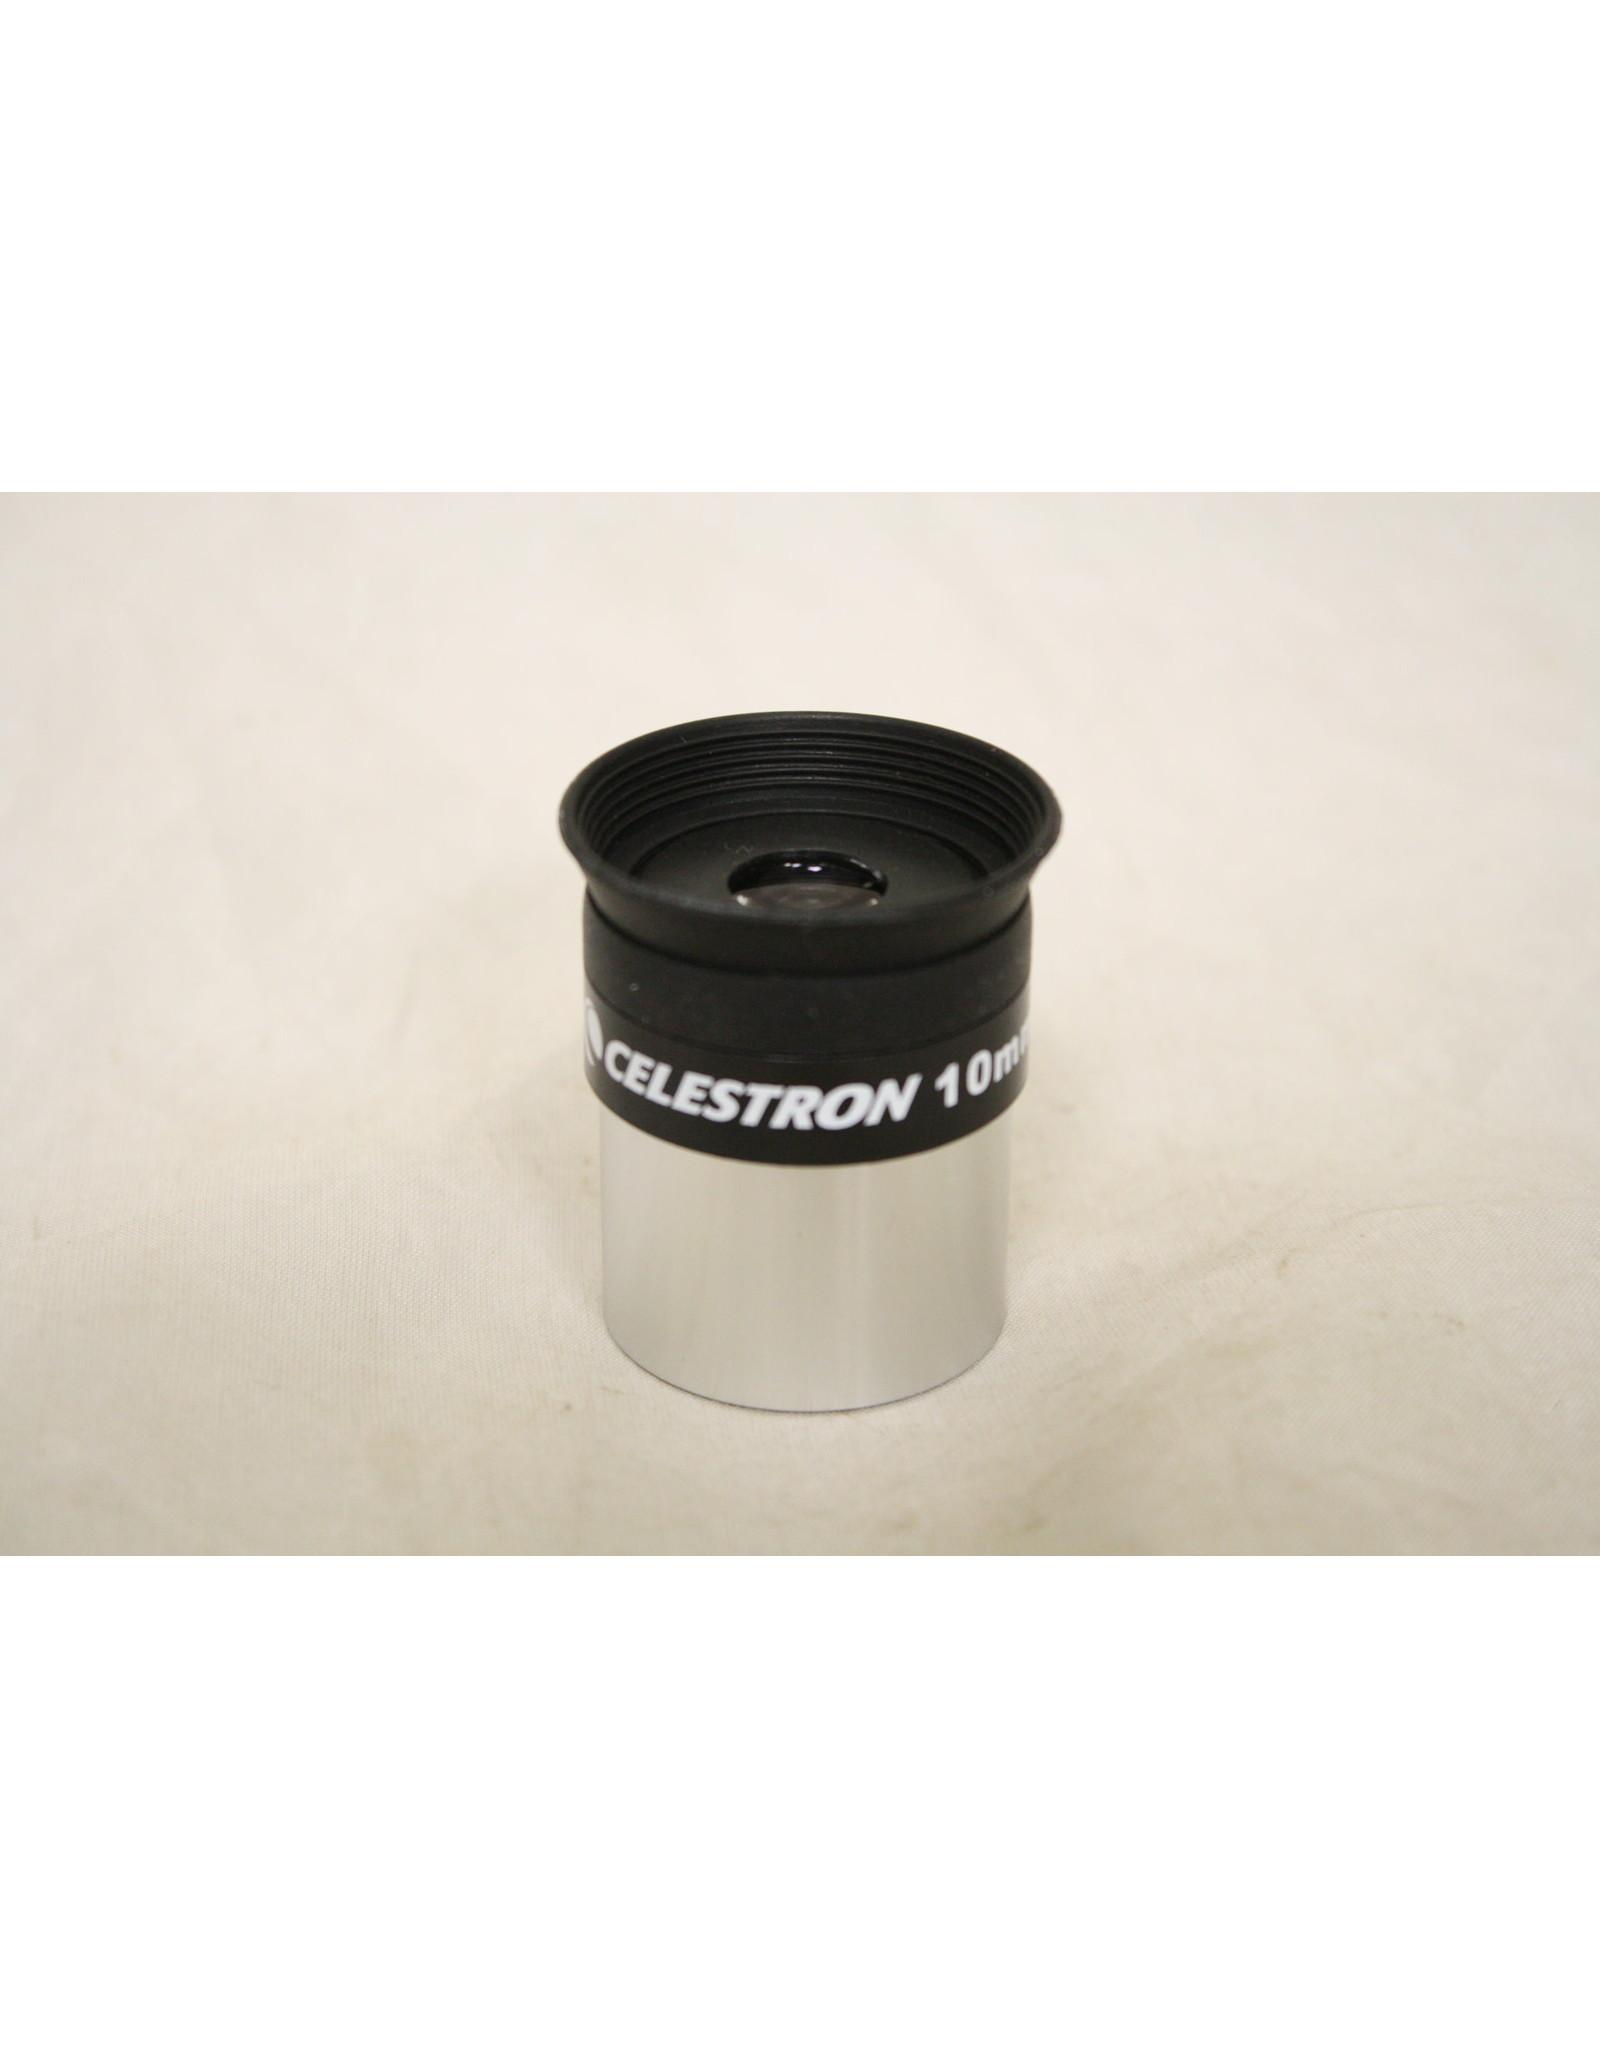 Celestron Celestron 10mm 1.25 (Pre-owned)